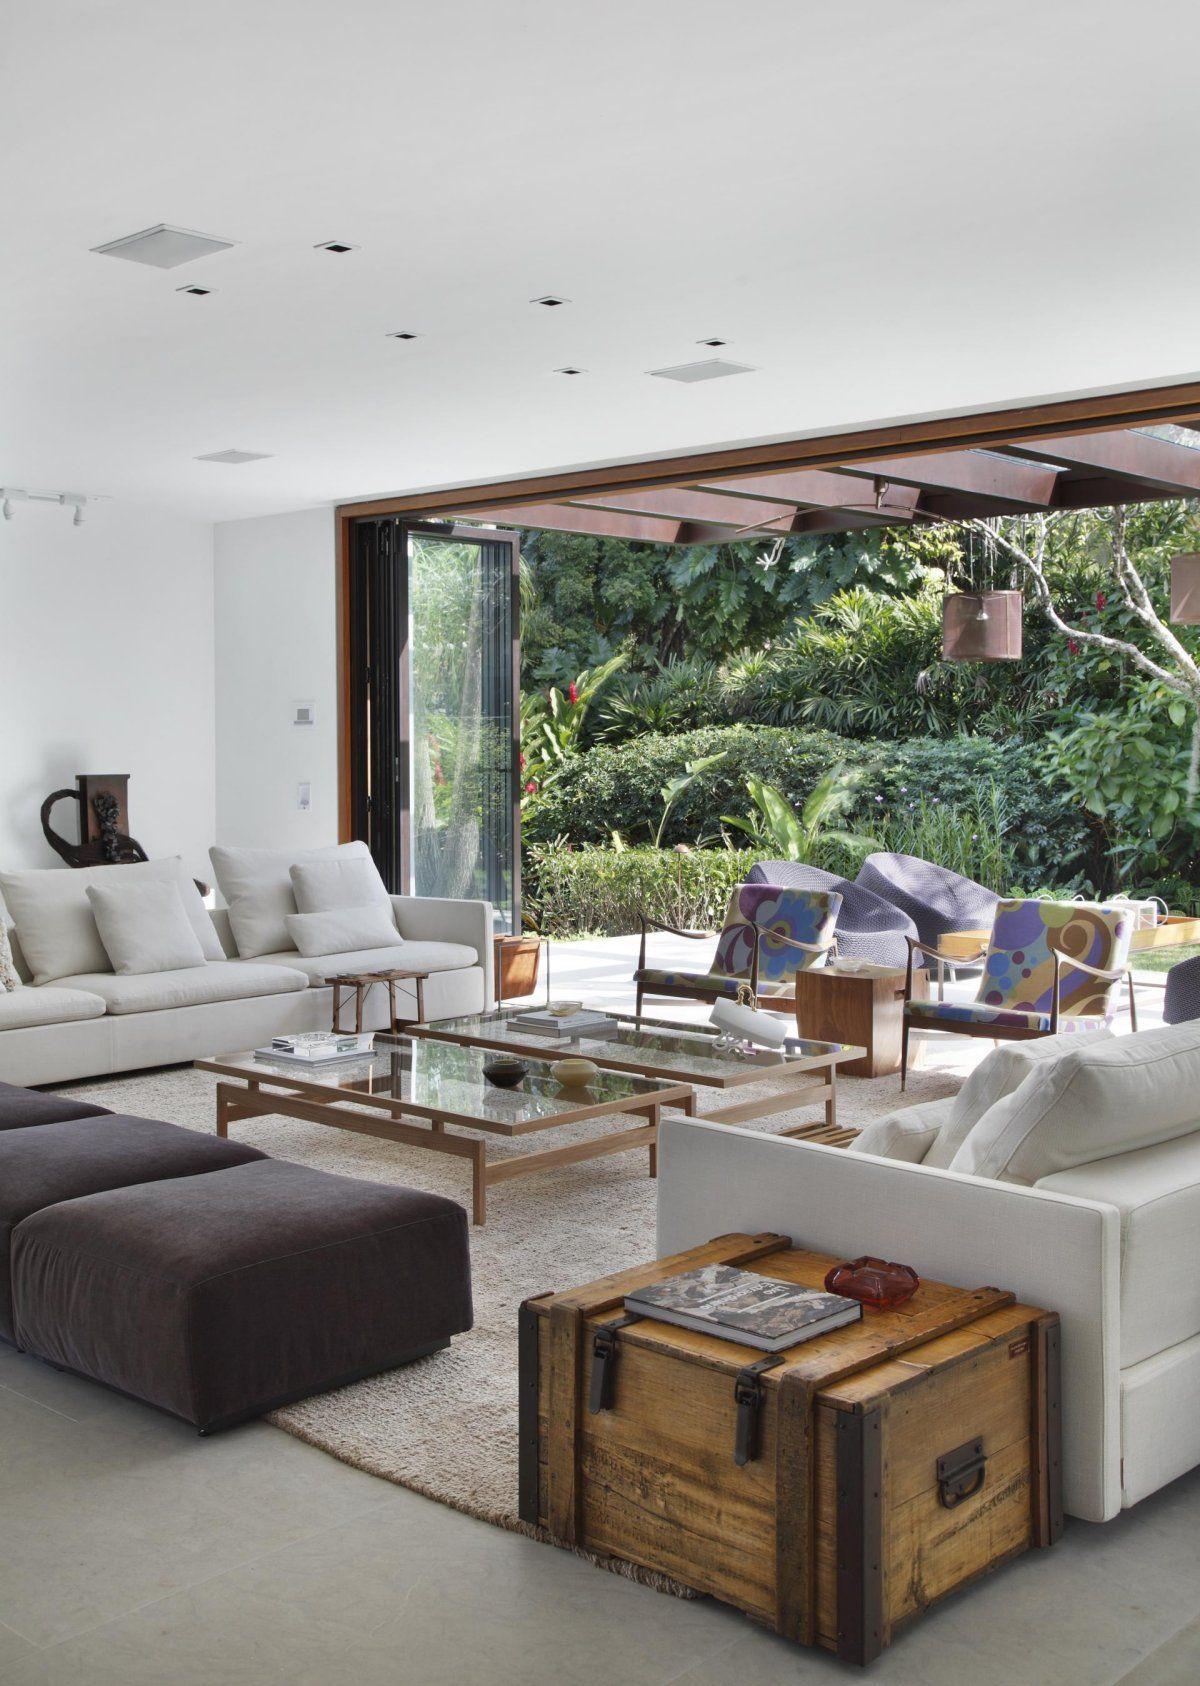 70 moderne innovative luxus interieur ideen frs wohnzimmer holztruhe modern design wohnzimmer moebel sofa - Luxus Design Wohnzimmer